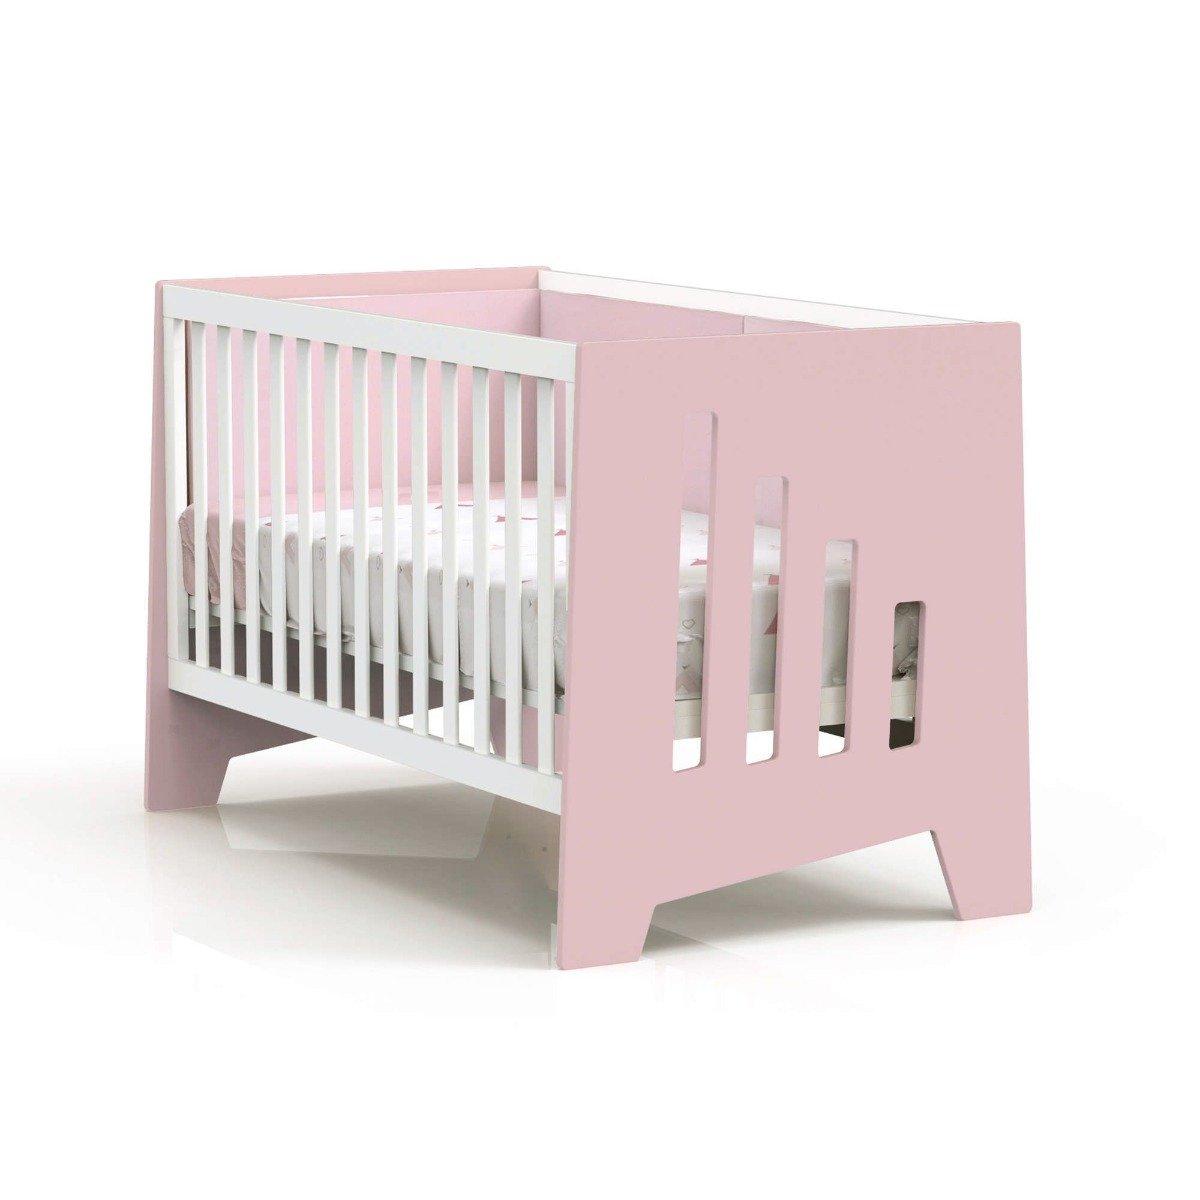 Patut bebe transformabil Home Concept, Roz imagine